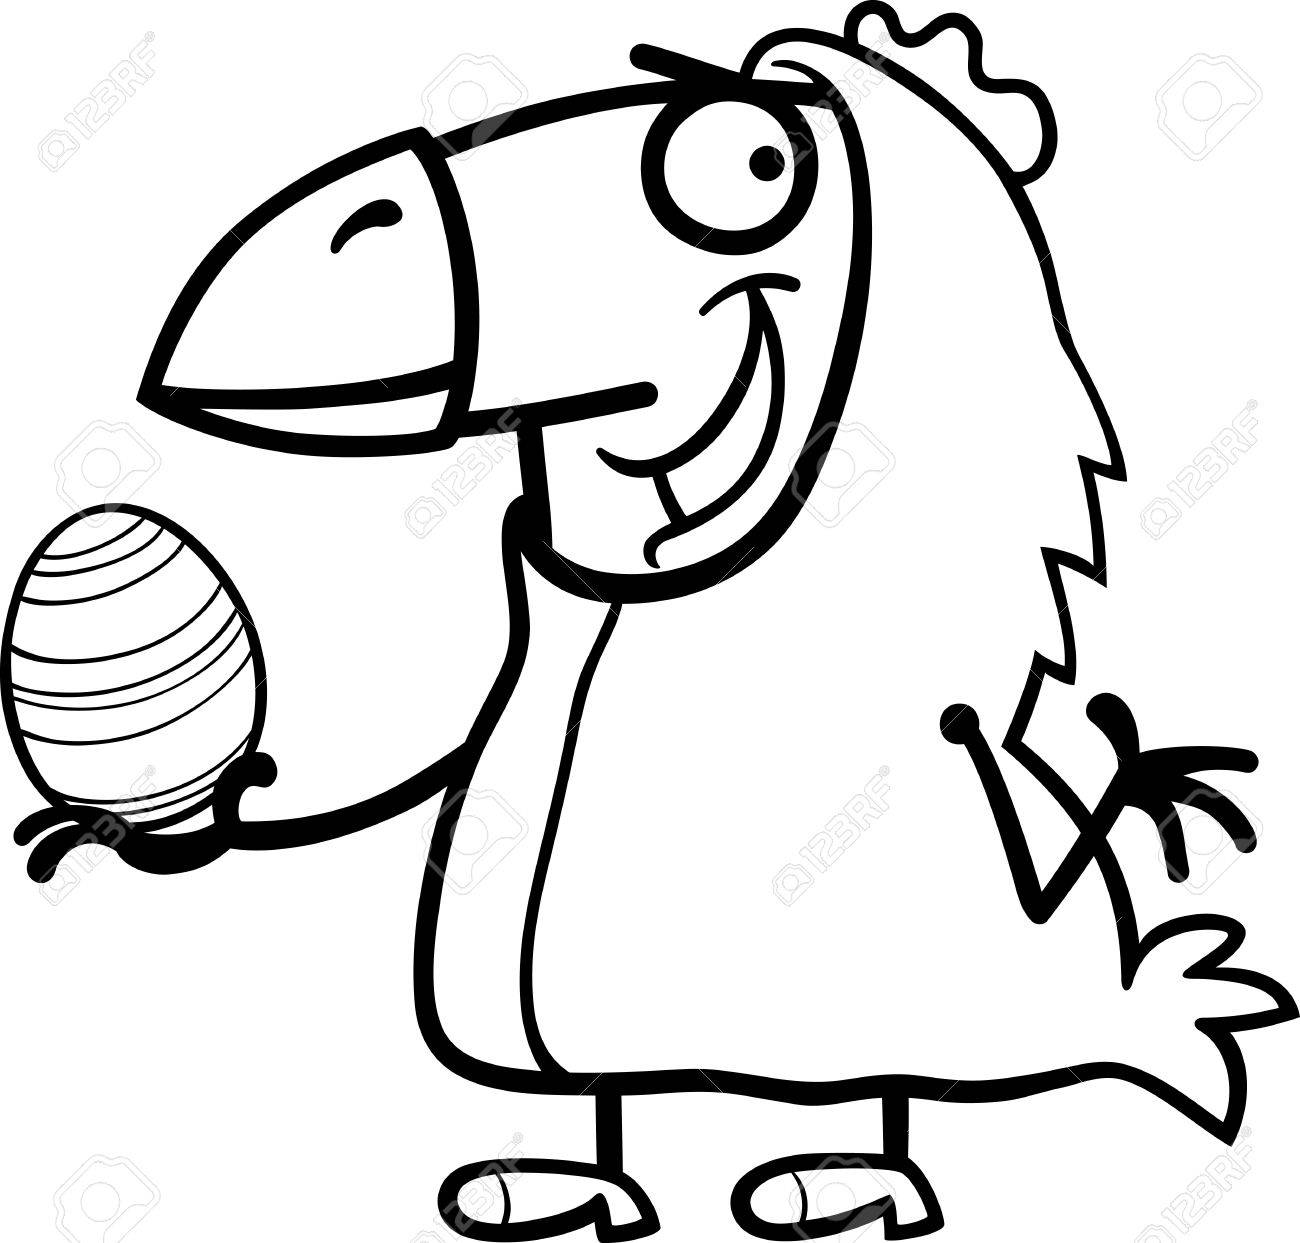 Black And White Cartoon Illustration Von Funny Man In Easter Chicken ...